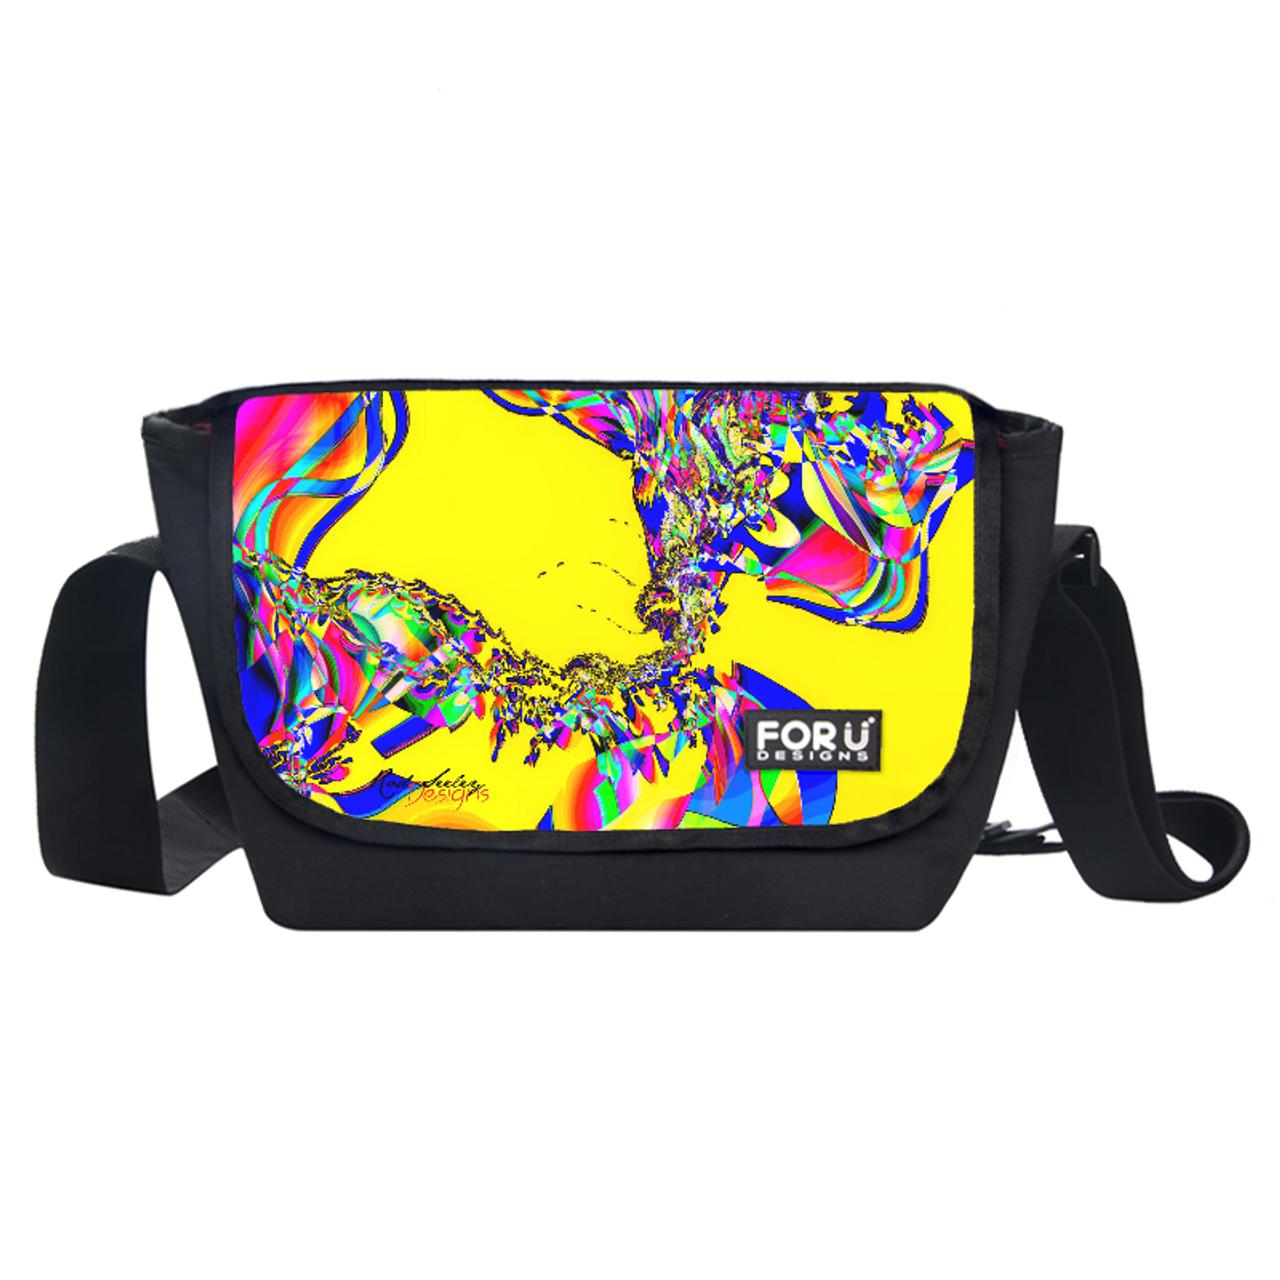 Yellow Rainbow Flow - Messenger Bag GL0003N  - Rod Seeley Designs ... 02fe830ae8d5a